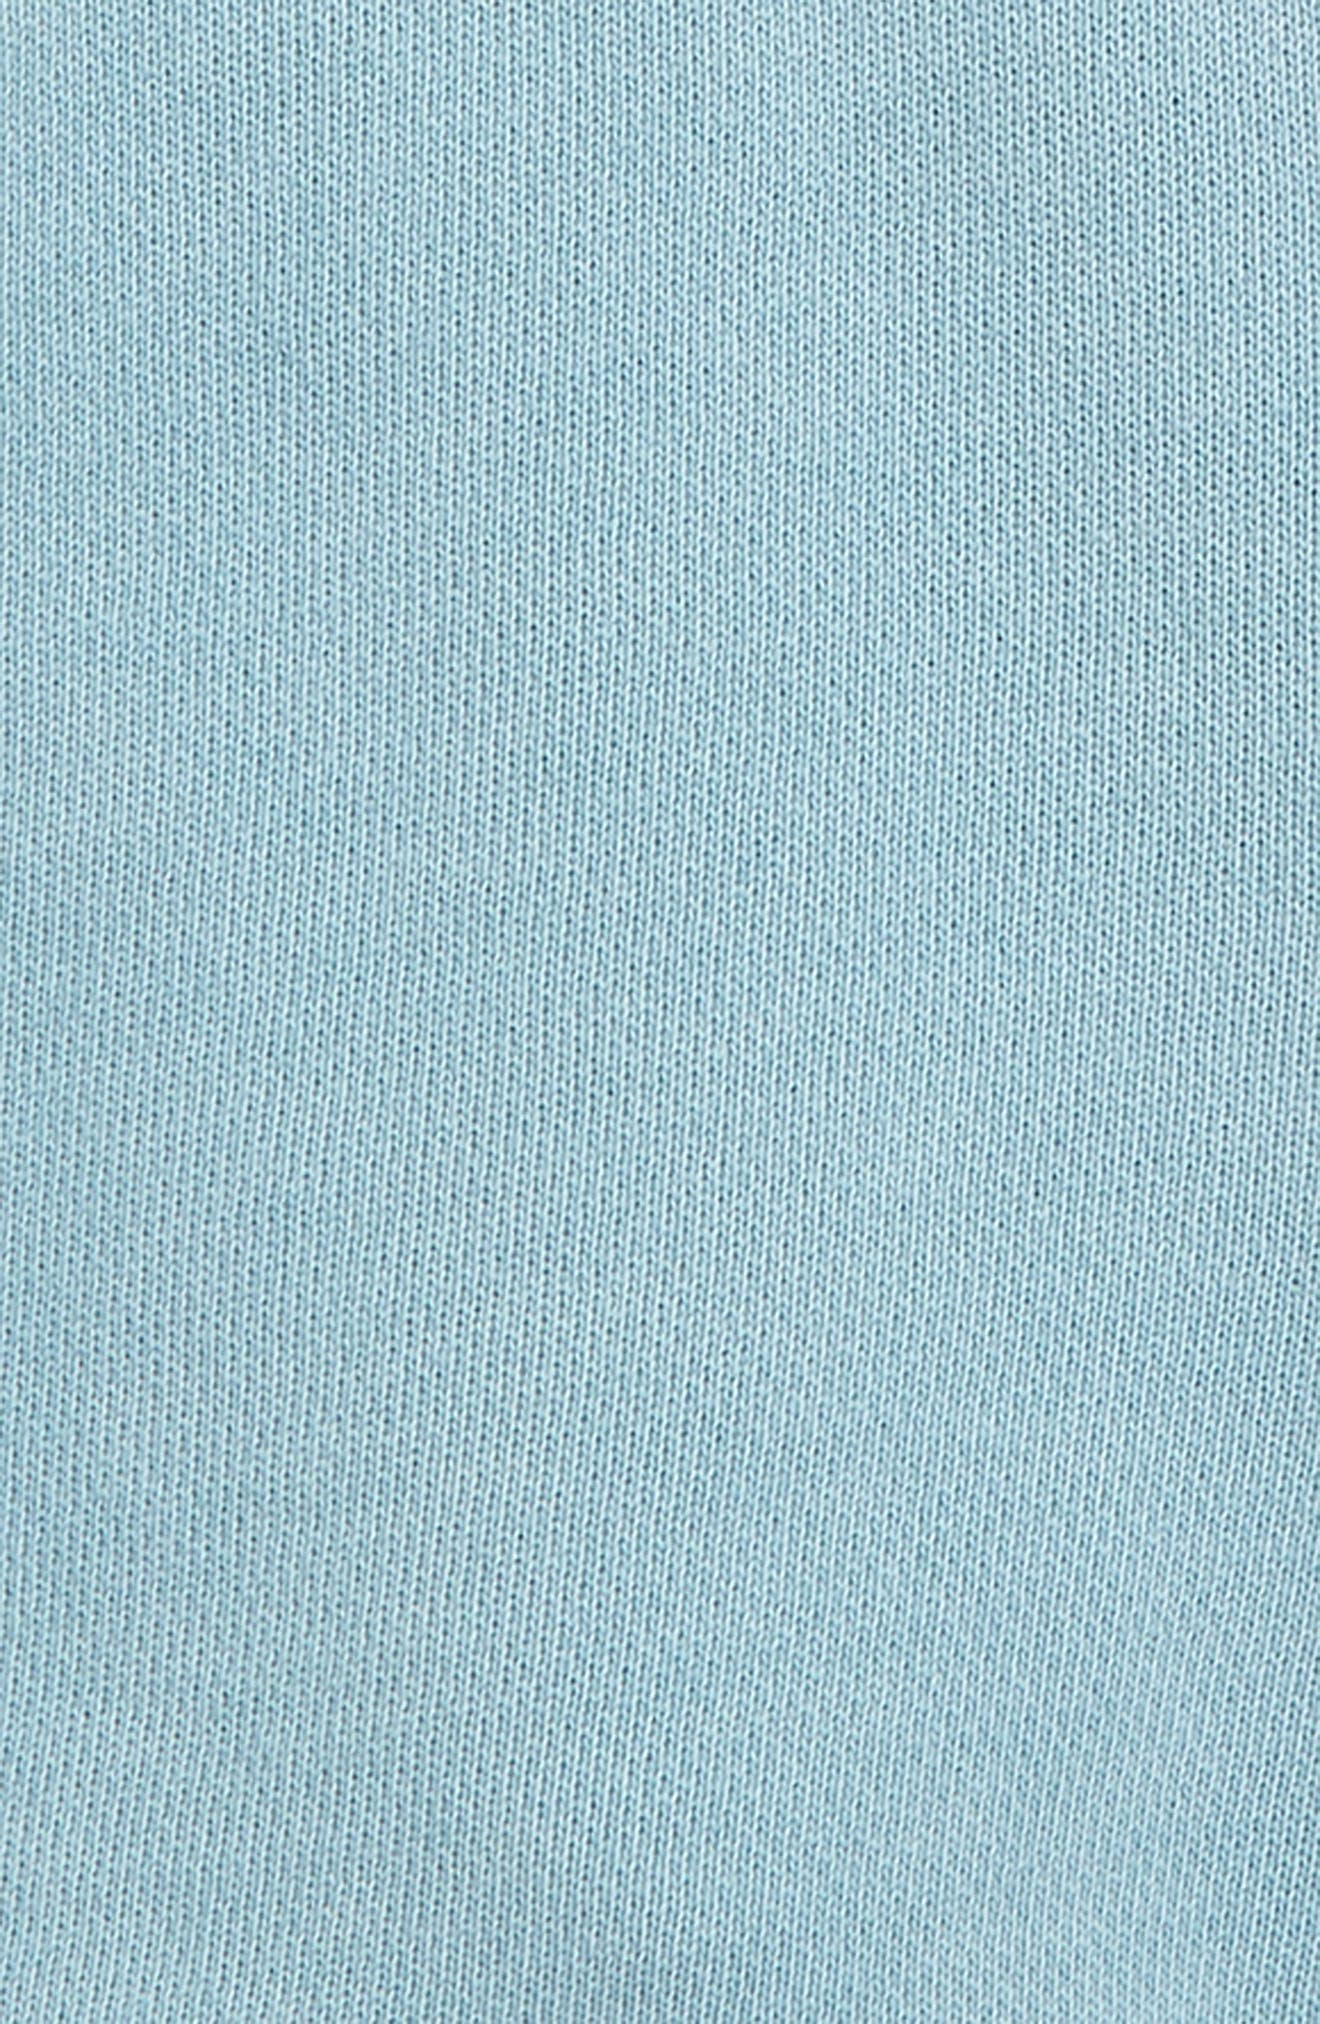 ,                             Garment Dye Jersey Shorts,                             Alternate thumbnail 2, color,                             SBL MINERAL BLUE